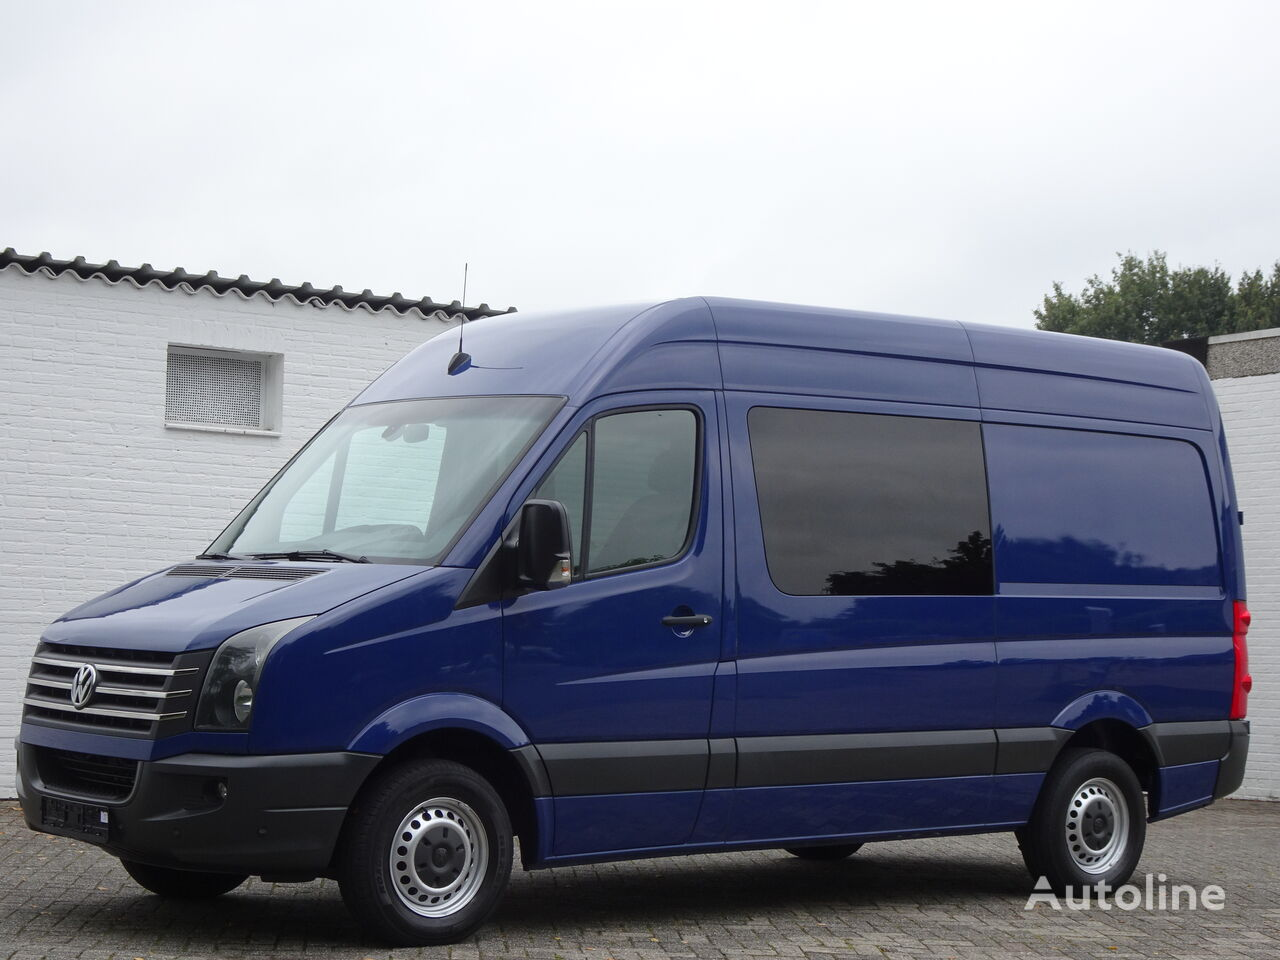 VOLKSWAGEN Crafter 2.0 Tdi 100 kw L2H2 Doppelkabine Klima Ahk Pdc Euro 5 furgoneta